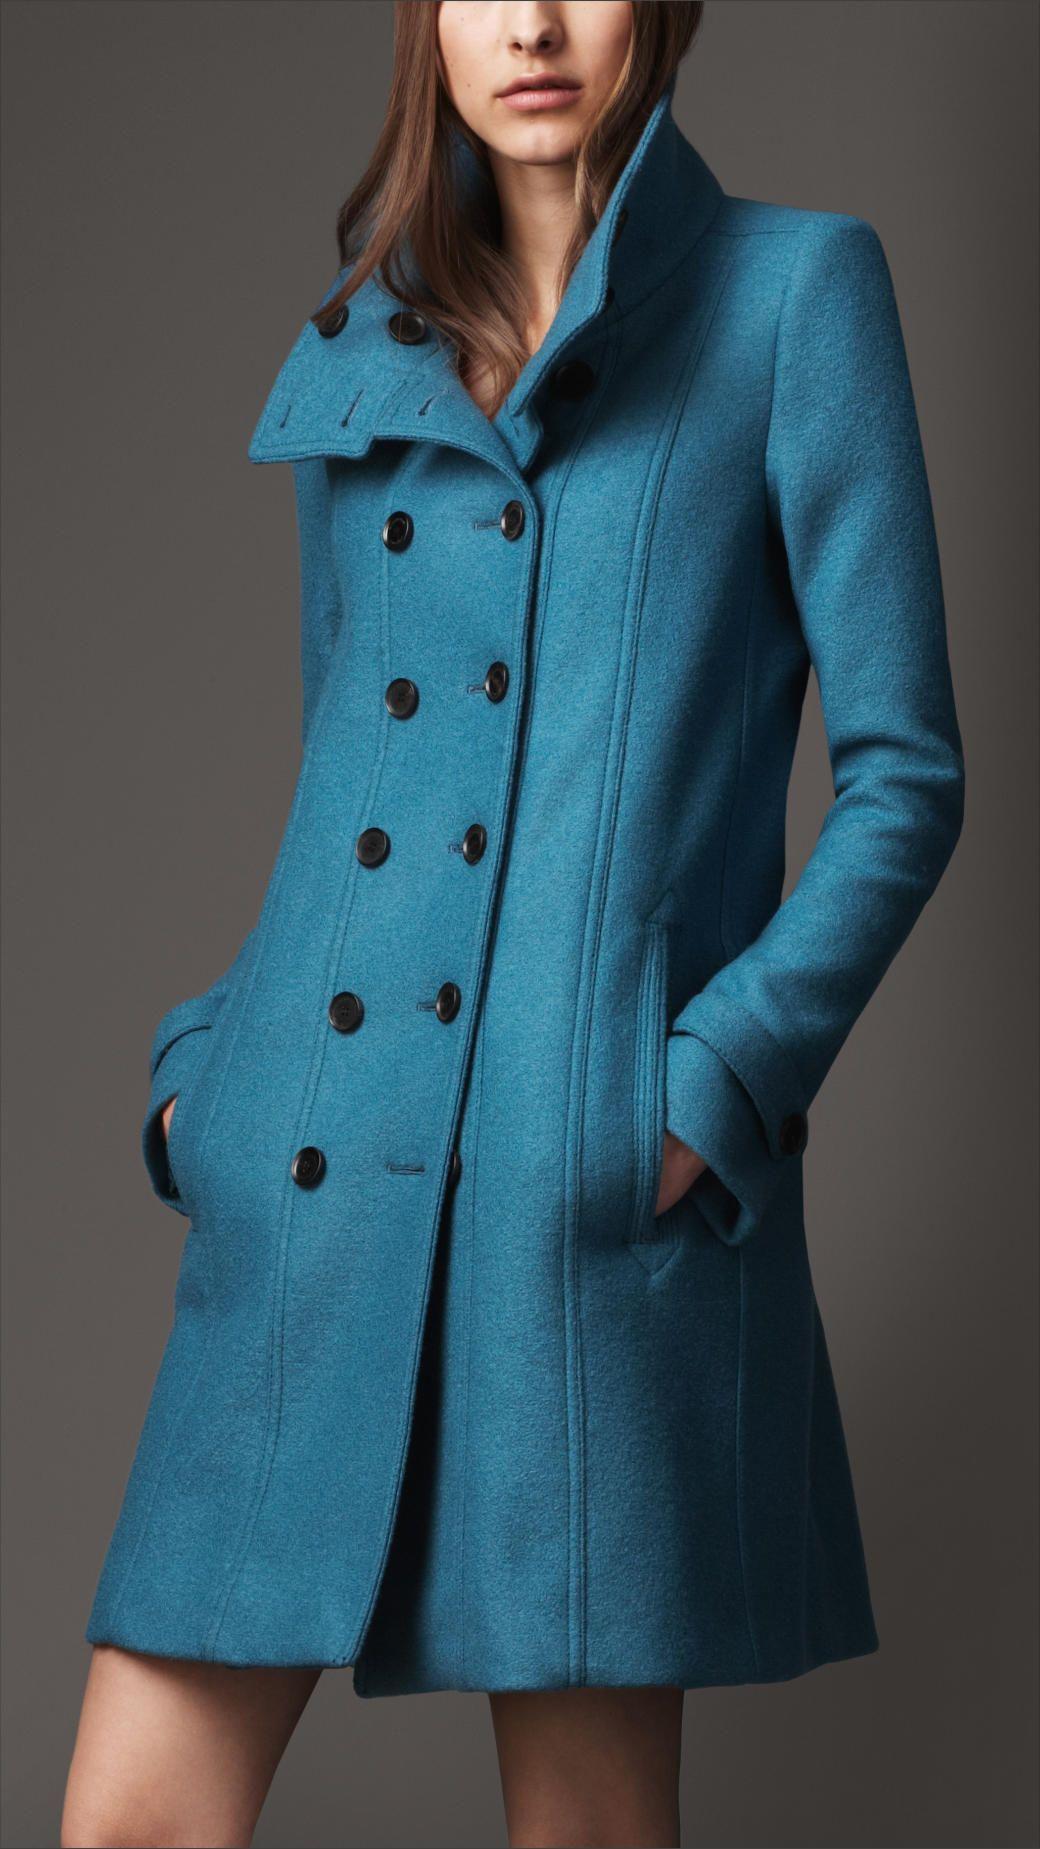 b3ae4b784ce9 Burberry Wool A-Line Coat in Blue (pale petrol blue)   Shopping Wish ...